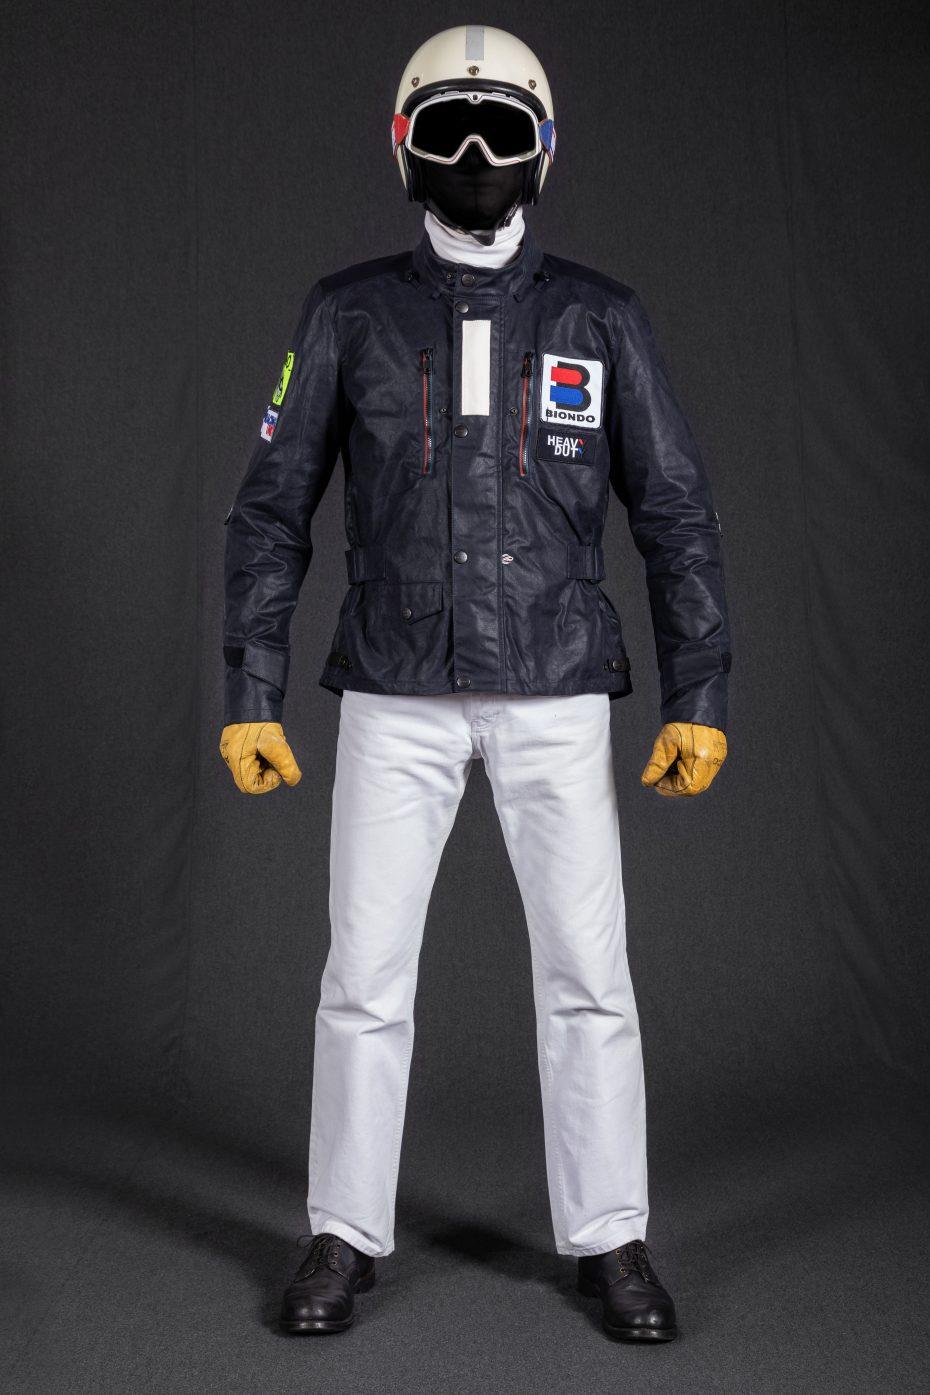 BiondoEndurance_Motorräder_GB_0009_Jacket-MkIII_RacingUnit_NavyBlue_CottonCanvas_Portrait_Front